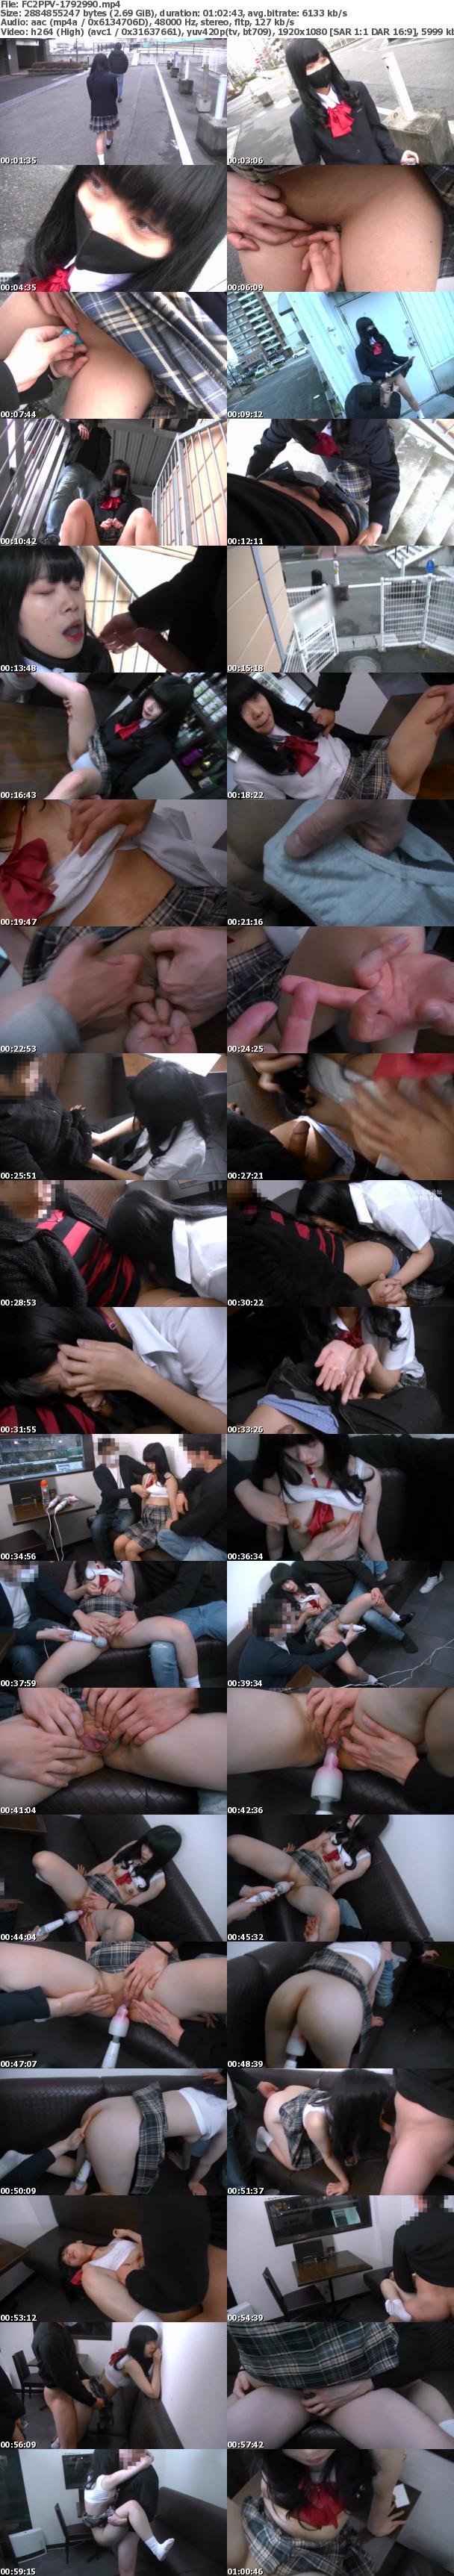 FC2-PPV 1792990 少女は地元出身校の前で露出をさせられファン参加公開乱交調教に放り込まれる。全ての穴を蹂躙され子宮奥に精子をぶちまくられる最悪の1日